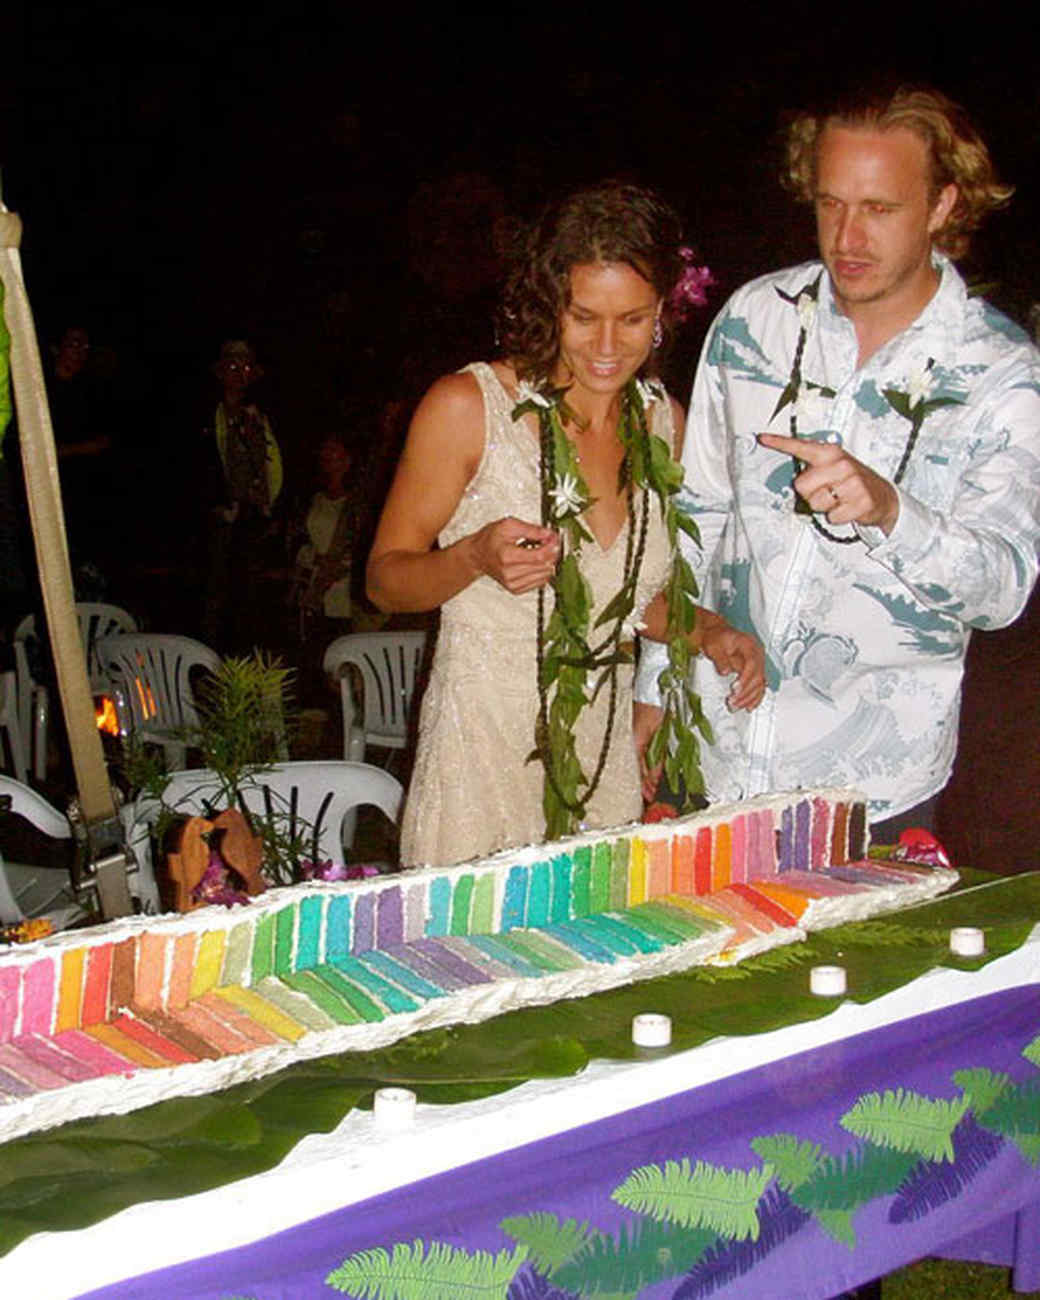 ms_celebrate_rainbow_wedding_cake.jpg